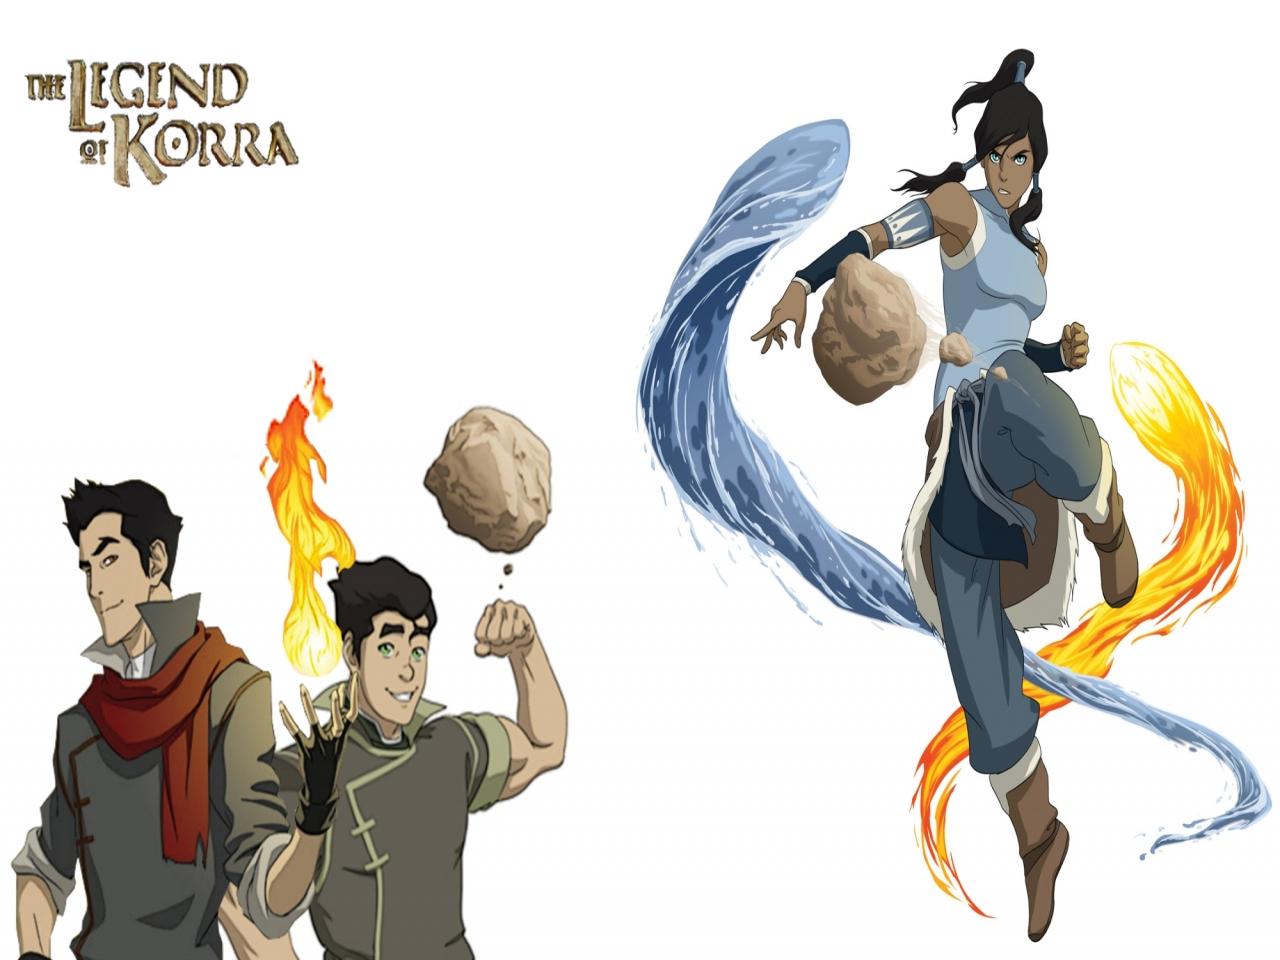 Free dwonload avatar the legend of korra powerpoint backgrounds ppt